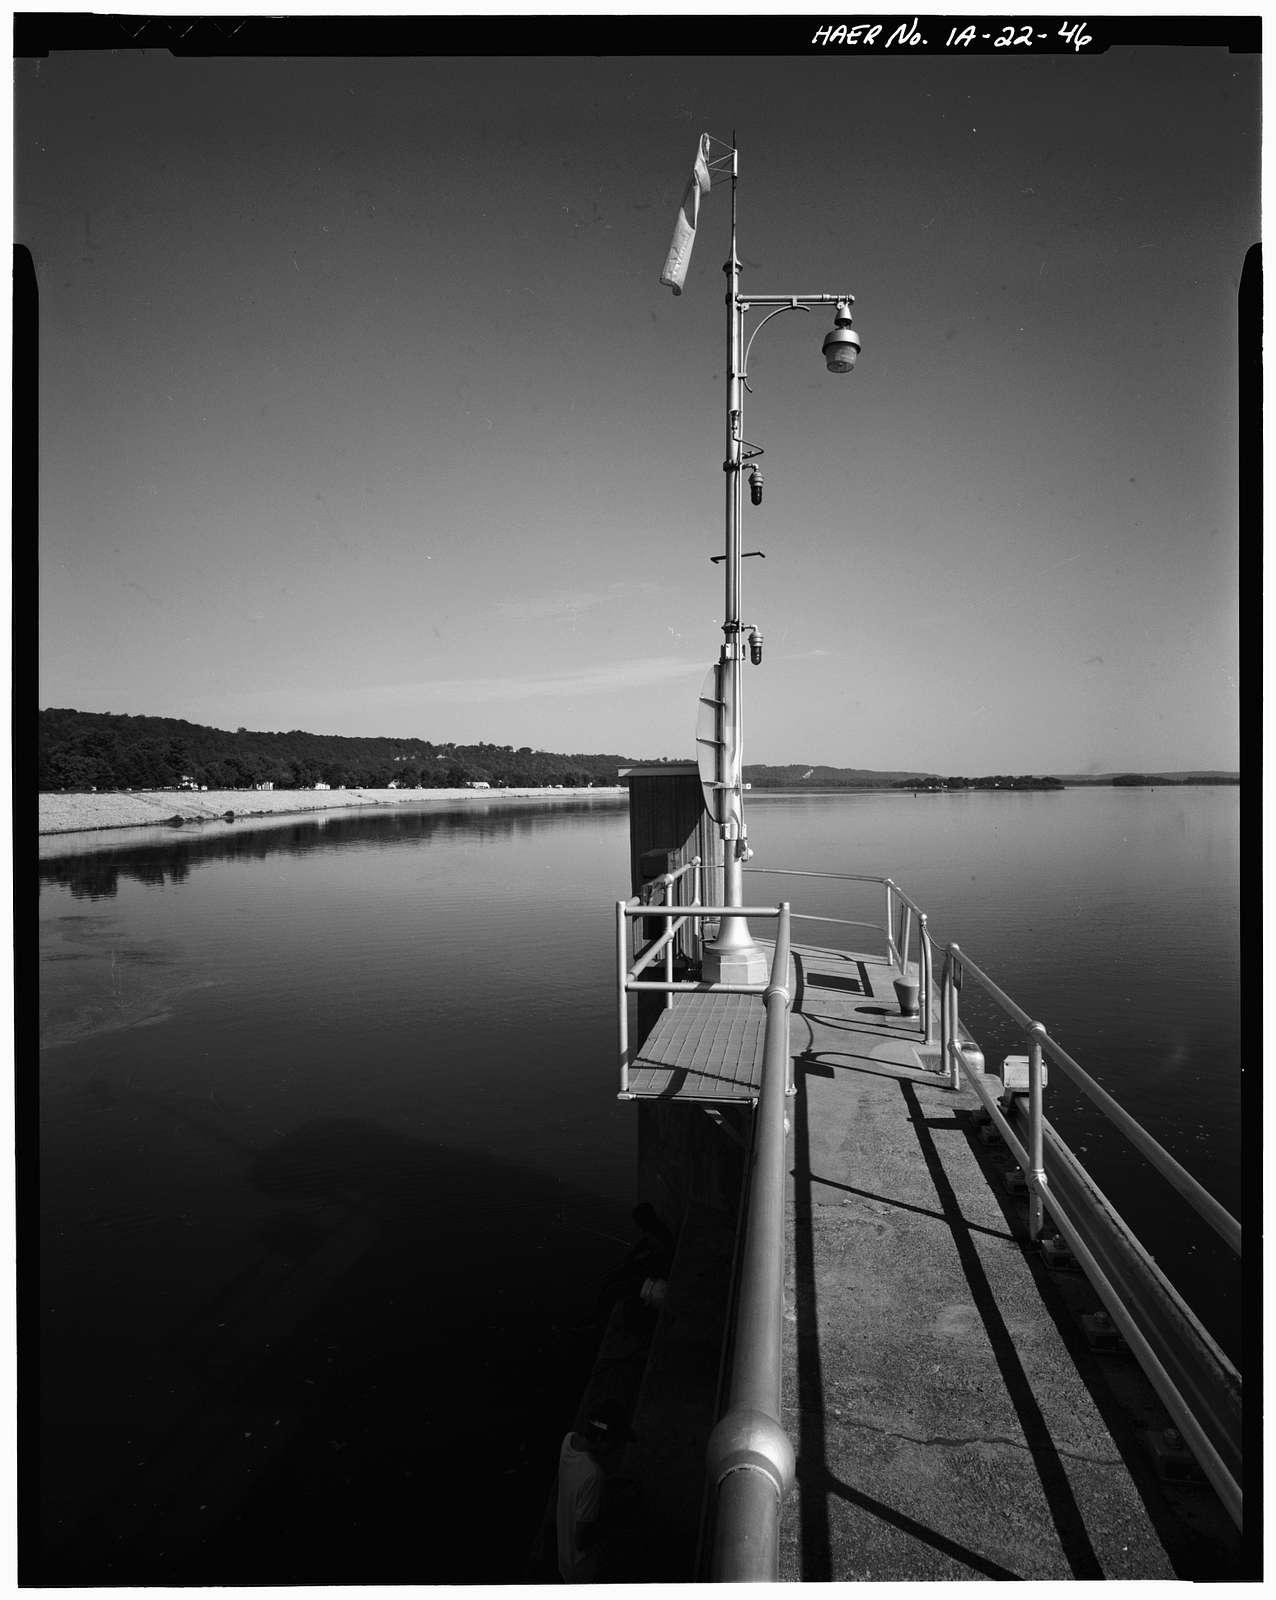 Upper Mississippi River 9-Foot Channel, Lock & Dam No. 10, Guttenberg, Clayton County, IA